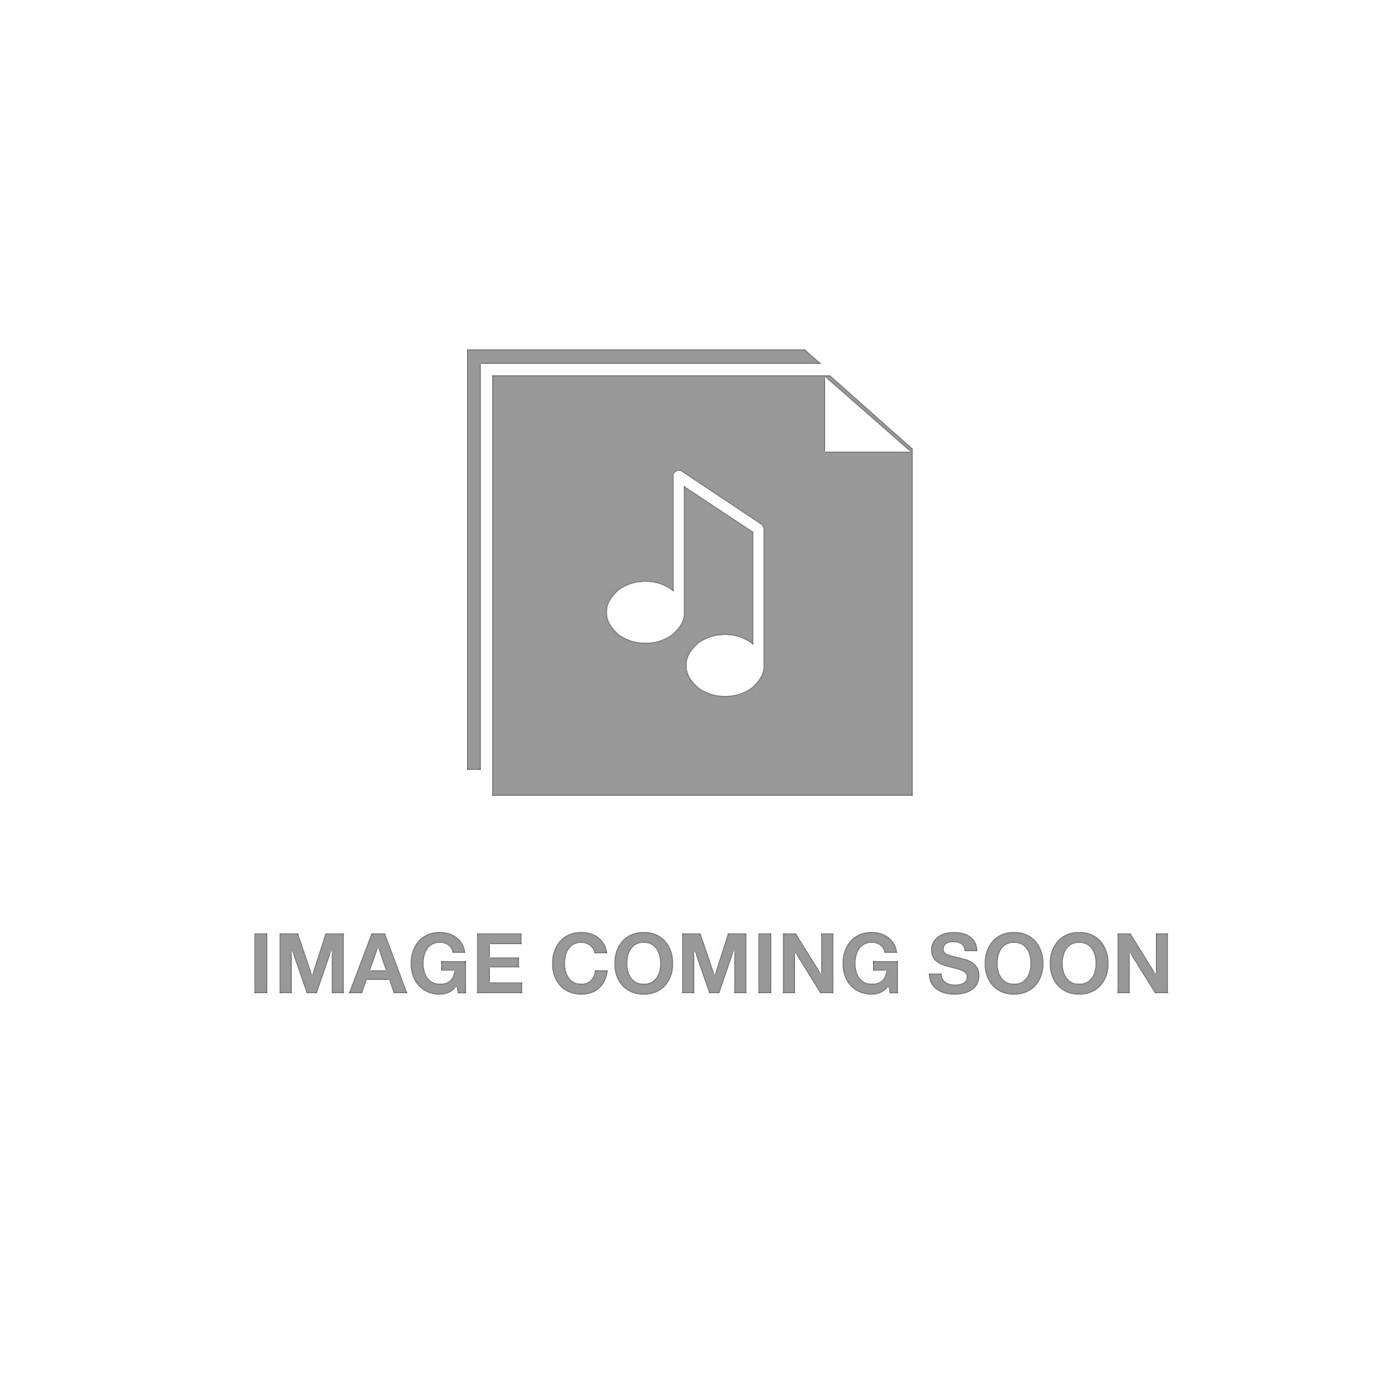 Shawnee Press Three Christmas Carols (Woodwind Quintet) WOODWIND PARTS thumbnail